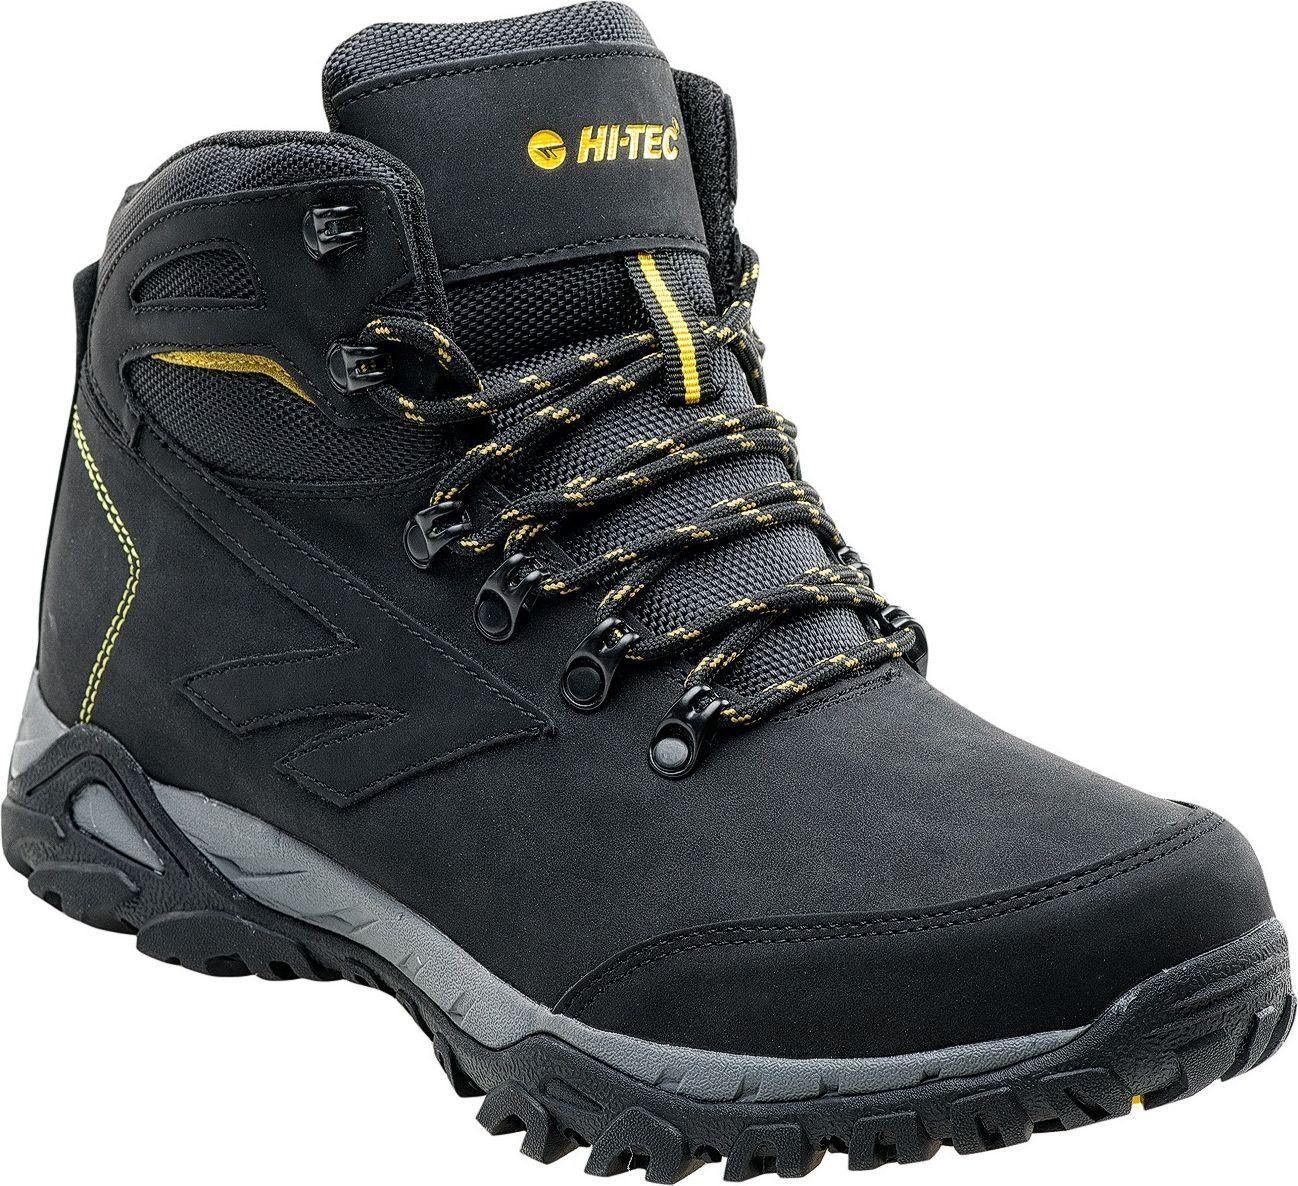 91d756b2 Hi-tec Buty męskie trekkingowe wysokie Nedin Mid b - 7718847538 ...